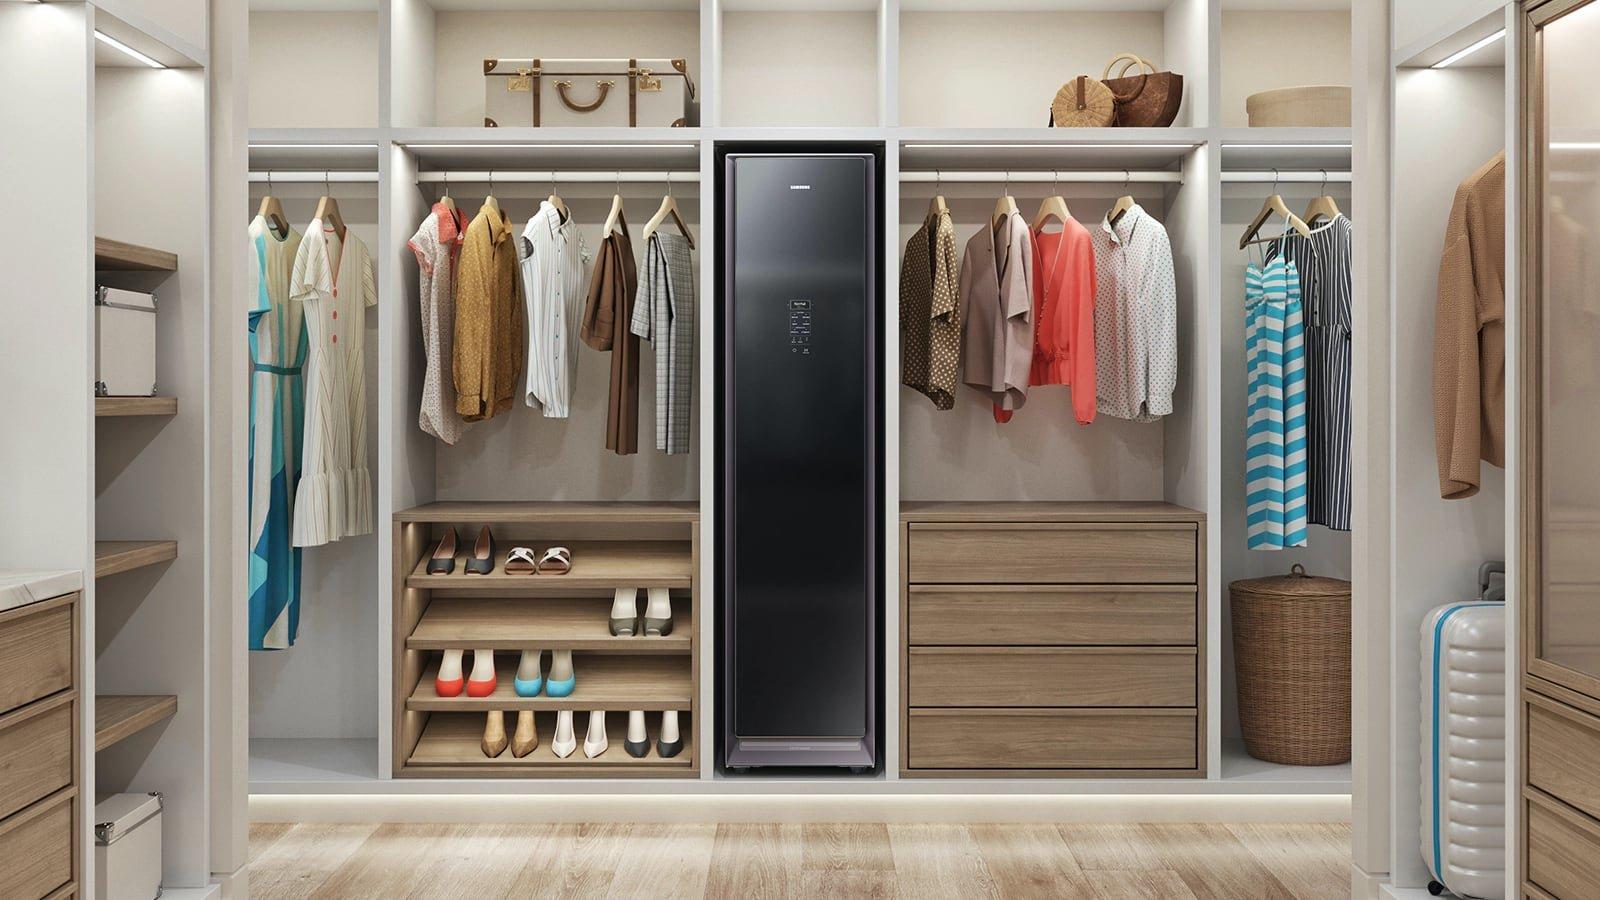 Samsung AirDresser keeps your wardrobe crisp and clean